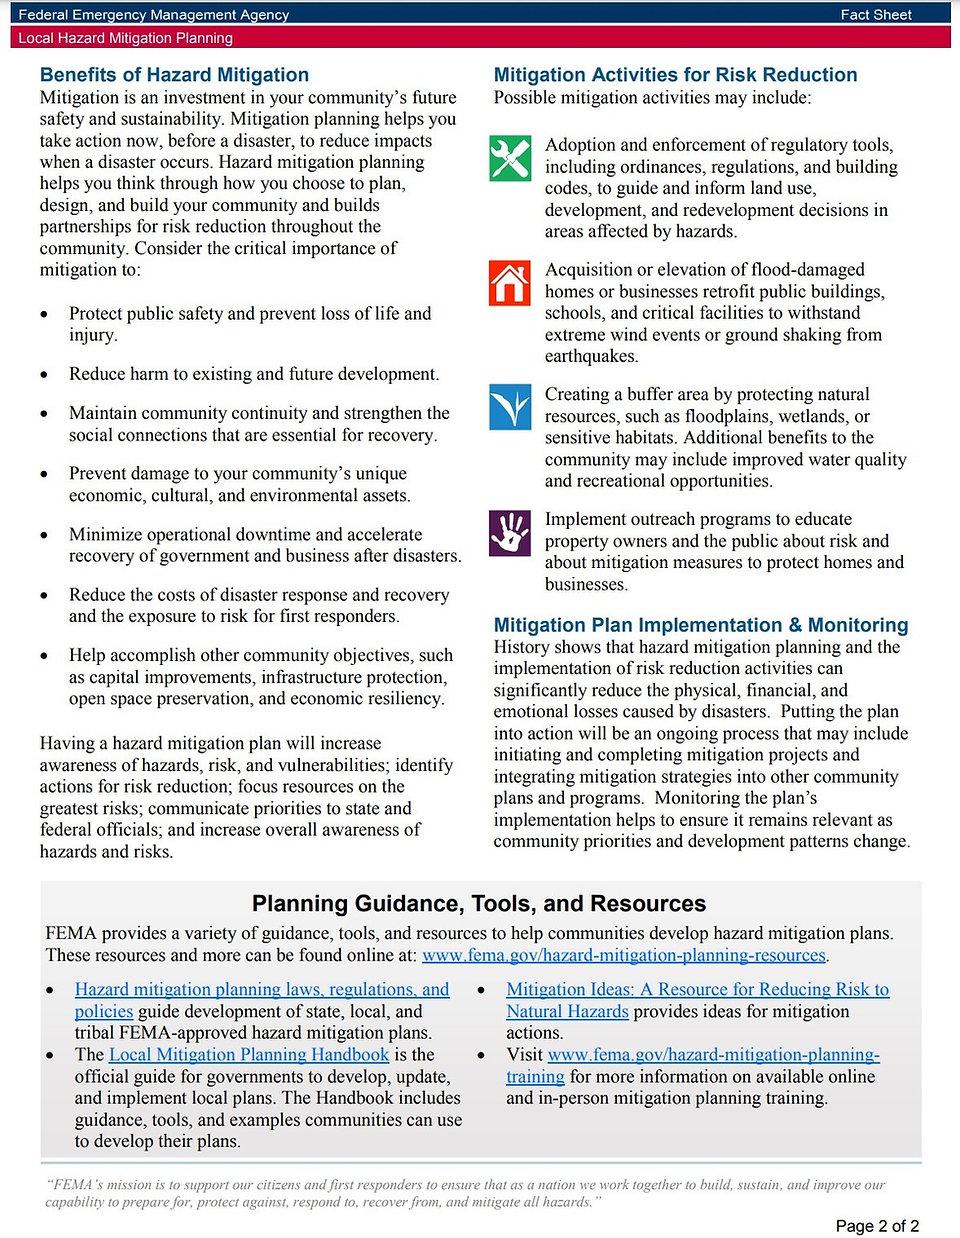 fema fact sheet 2.jpg